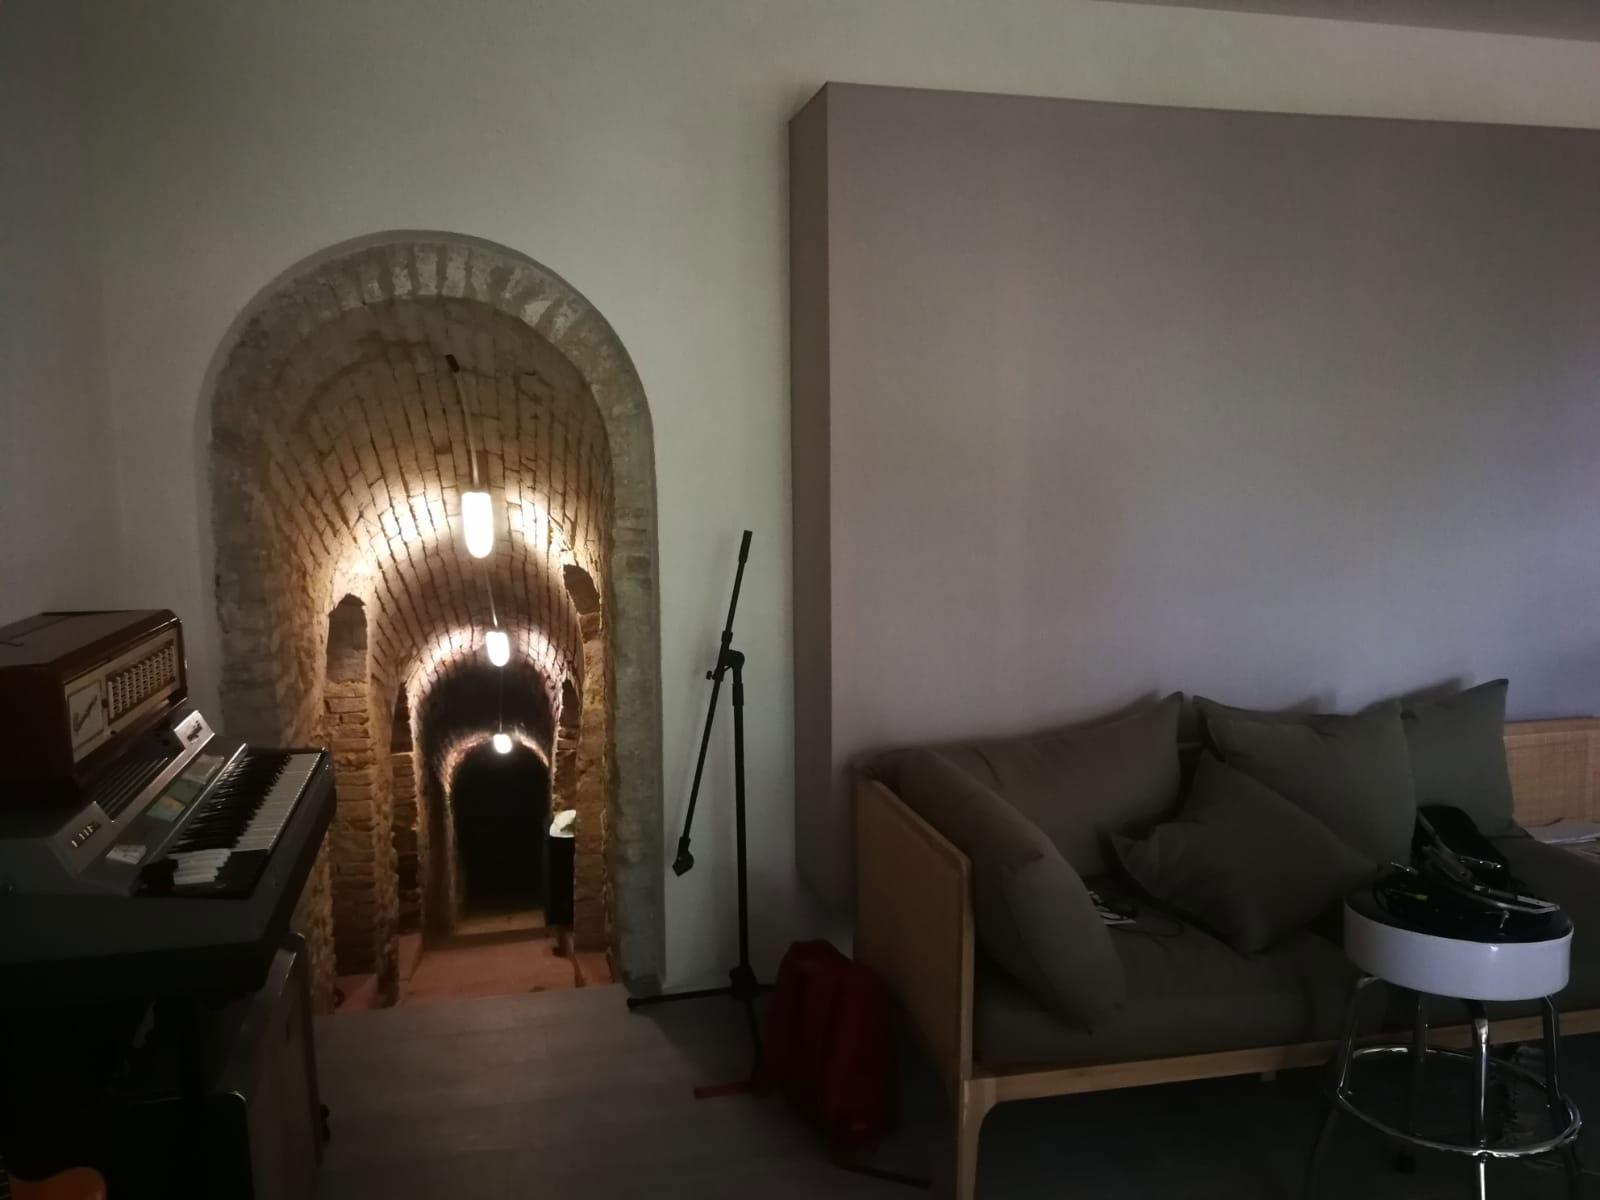 asaf-avidan-control-room